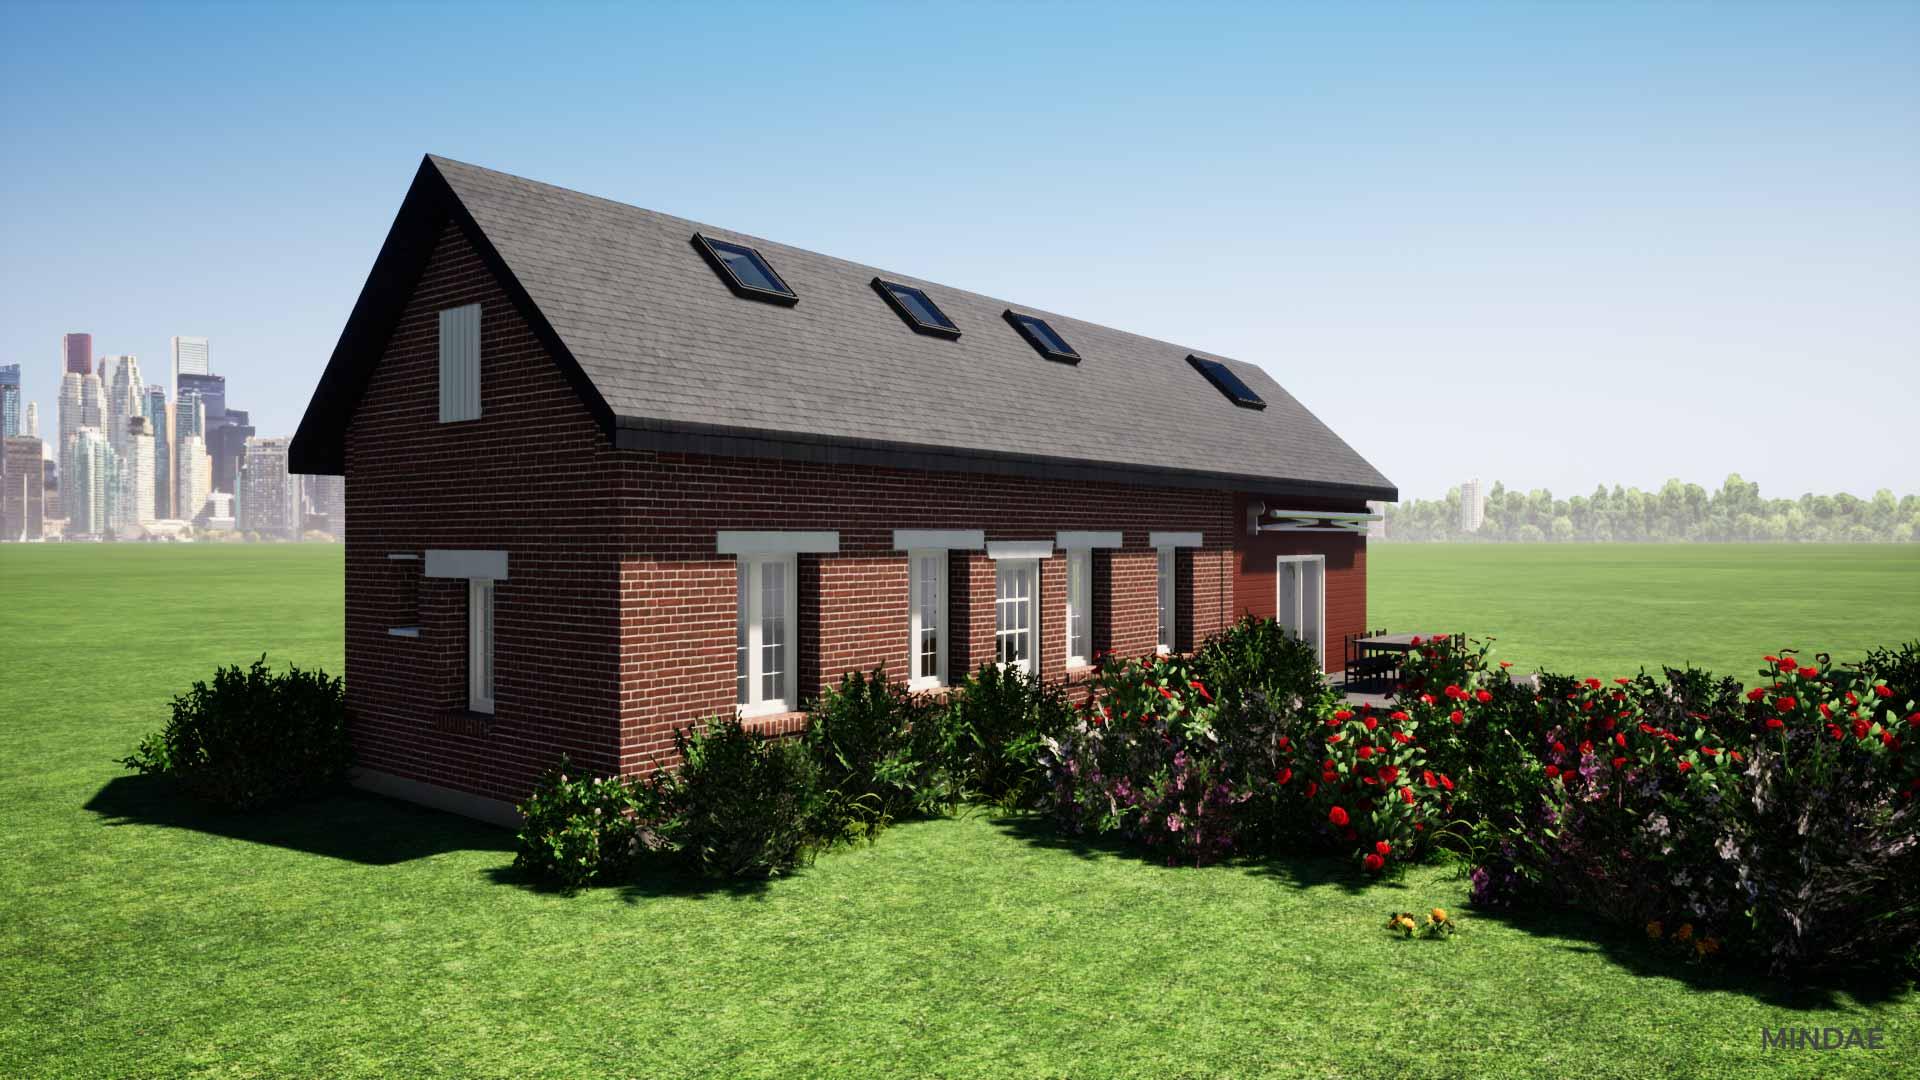 Mindae_3D_maison_extension_bois_Cambremer_terrasse-(1)